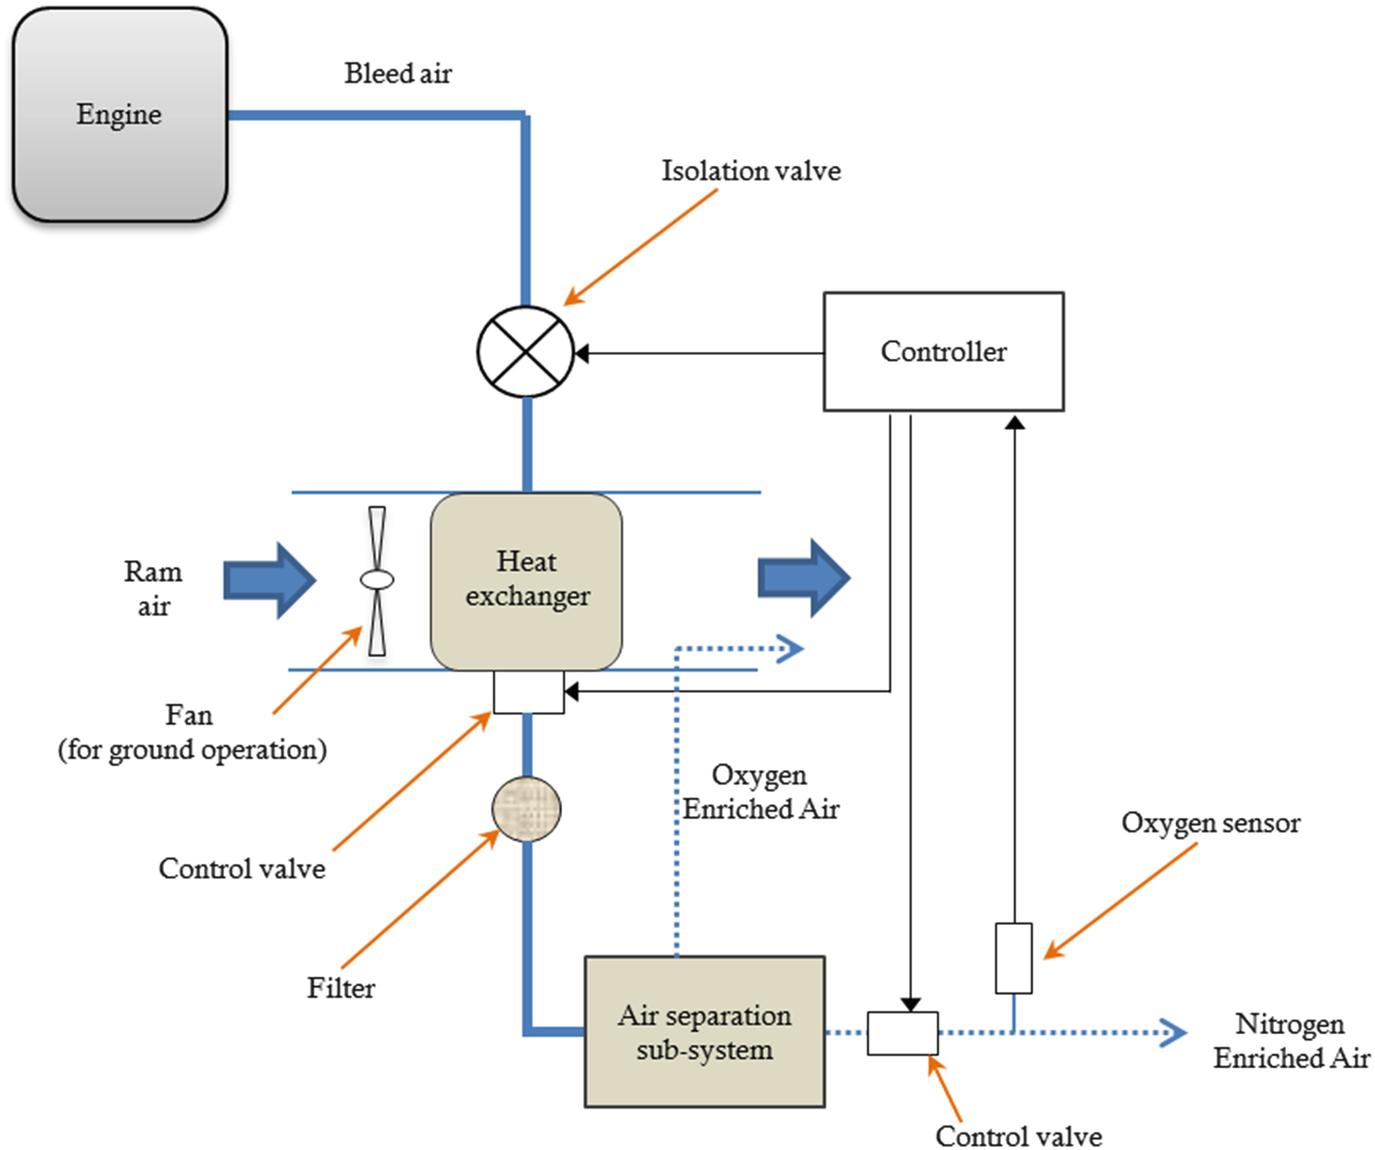 Luminescence-Based Sensors for Aeronautical Applications